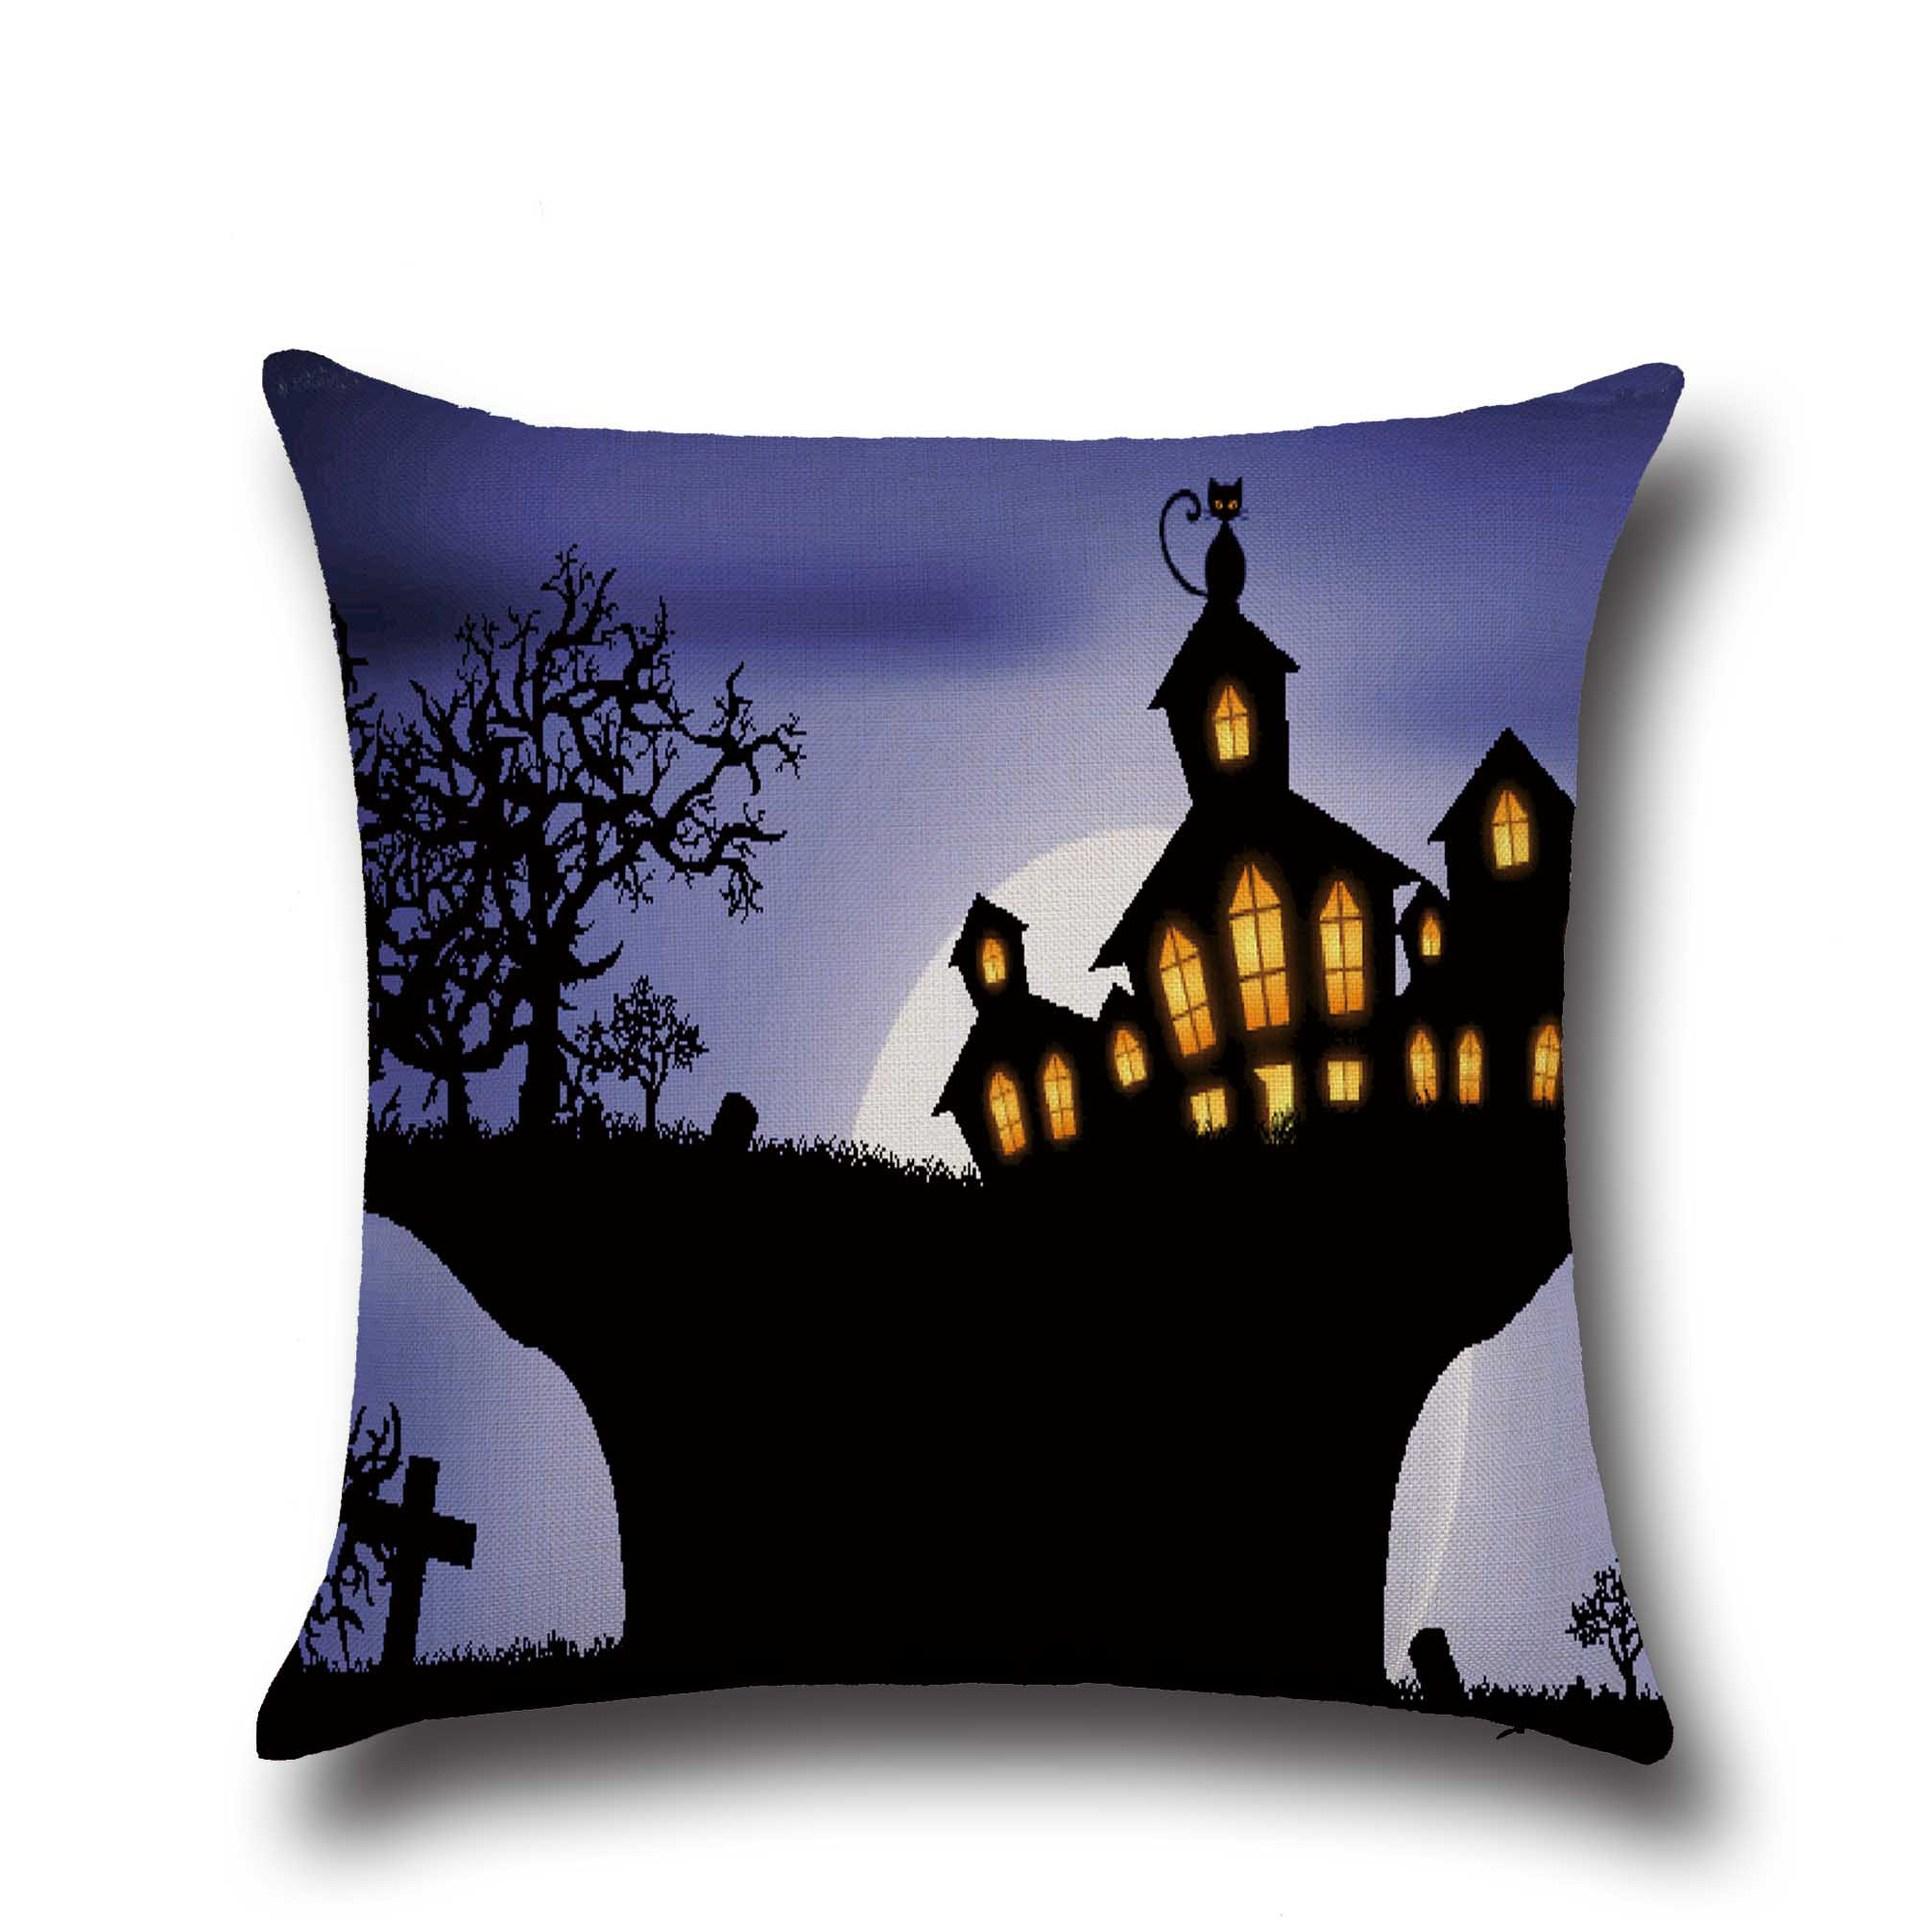 Halloween Pumpkin Bat Ghost Pattern Pillowcase Cotton Linen Throw Pillow Cushion Cover Seat Home Decoration Sofa Decor